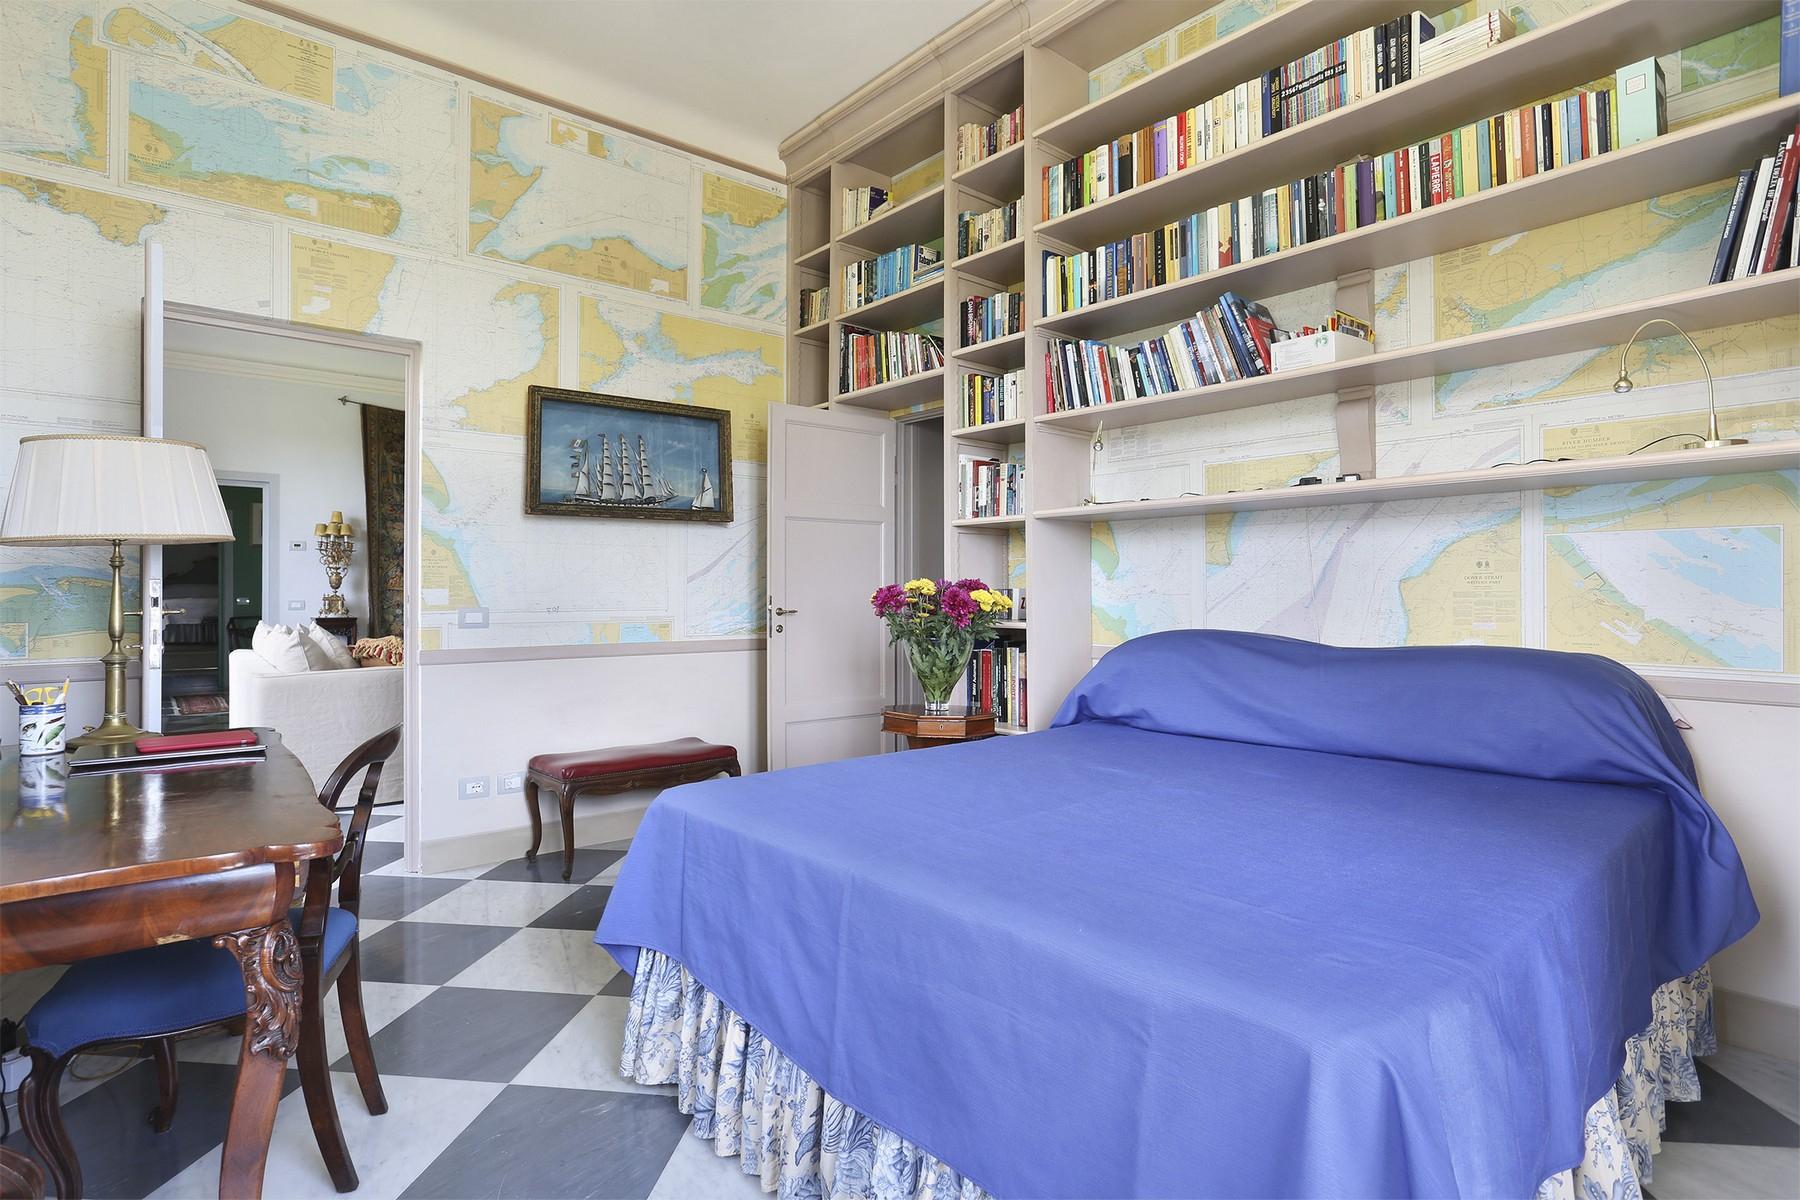 Villa in Vendita a Lucca: 5 locali, 735 mq - Foto 17